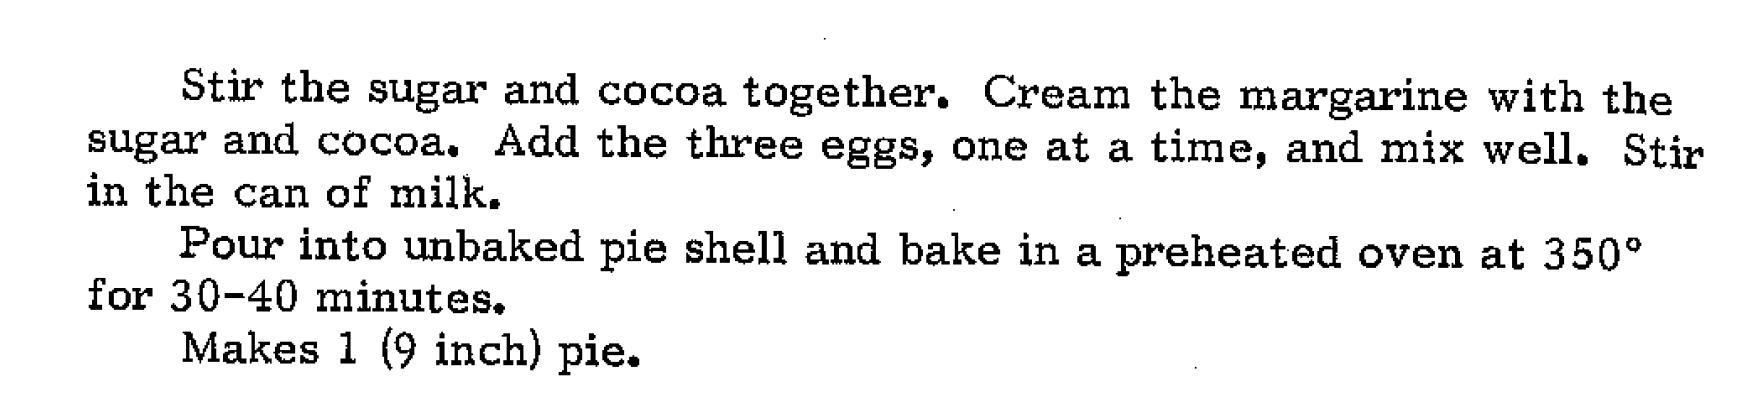 pie directions